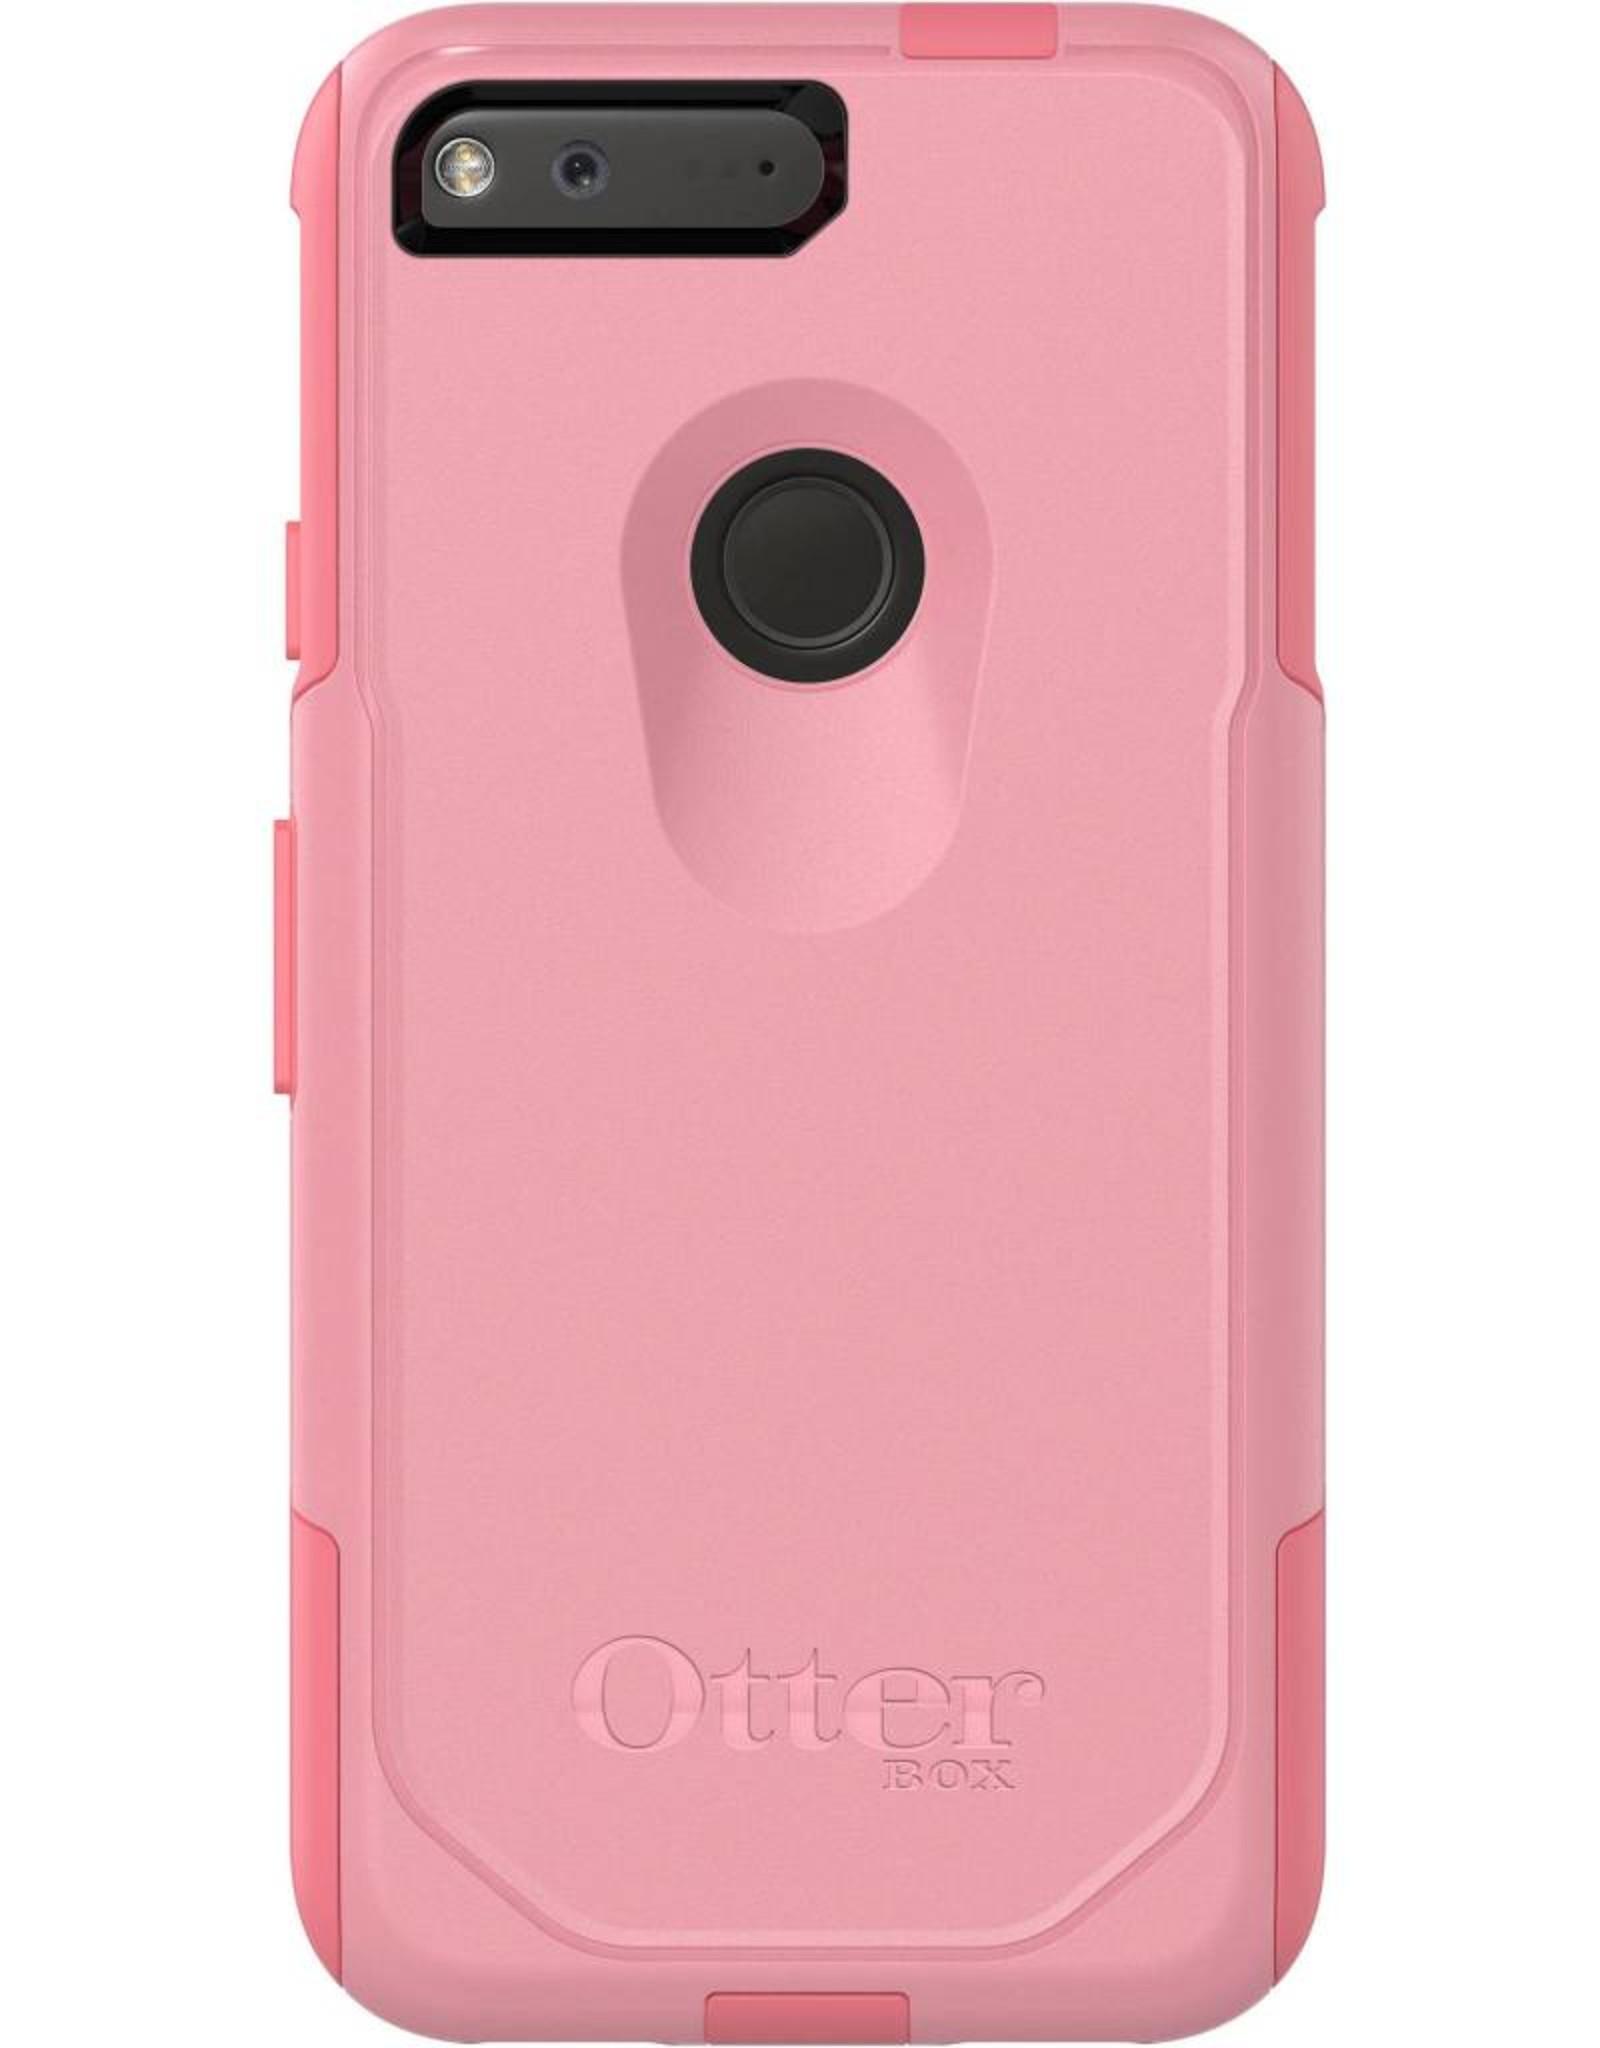 Otterbox OtterBox   Google Pixel Pink/Pink   15-01338